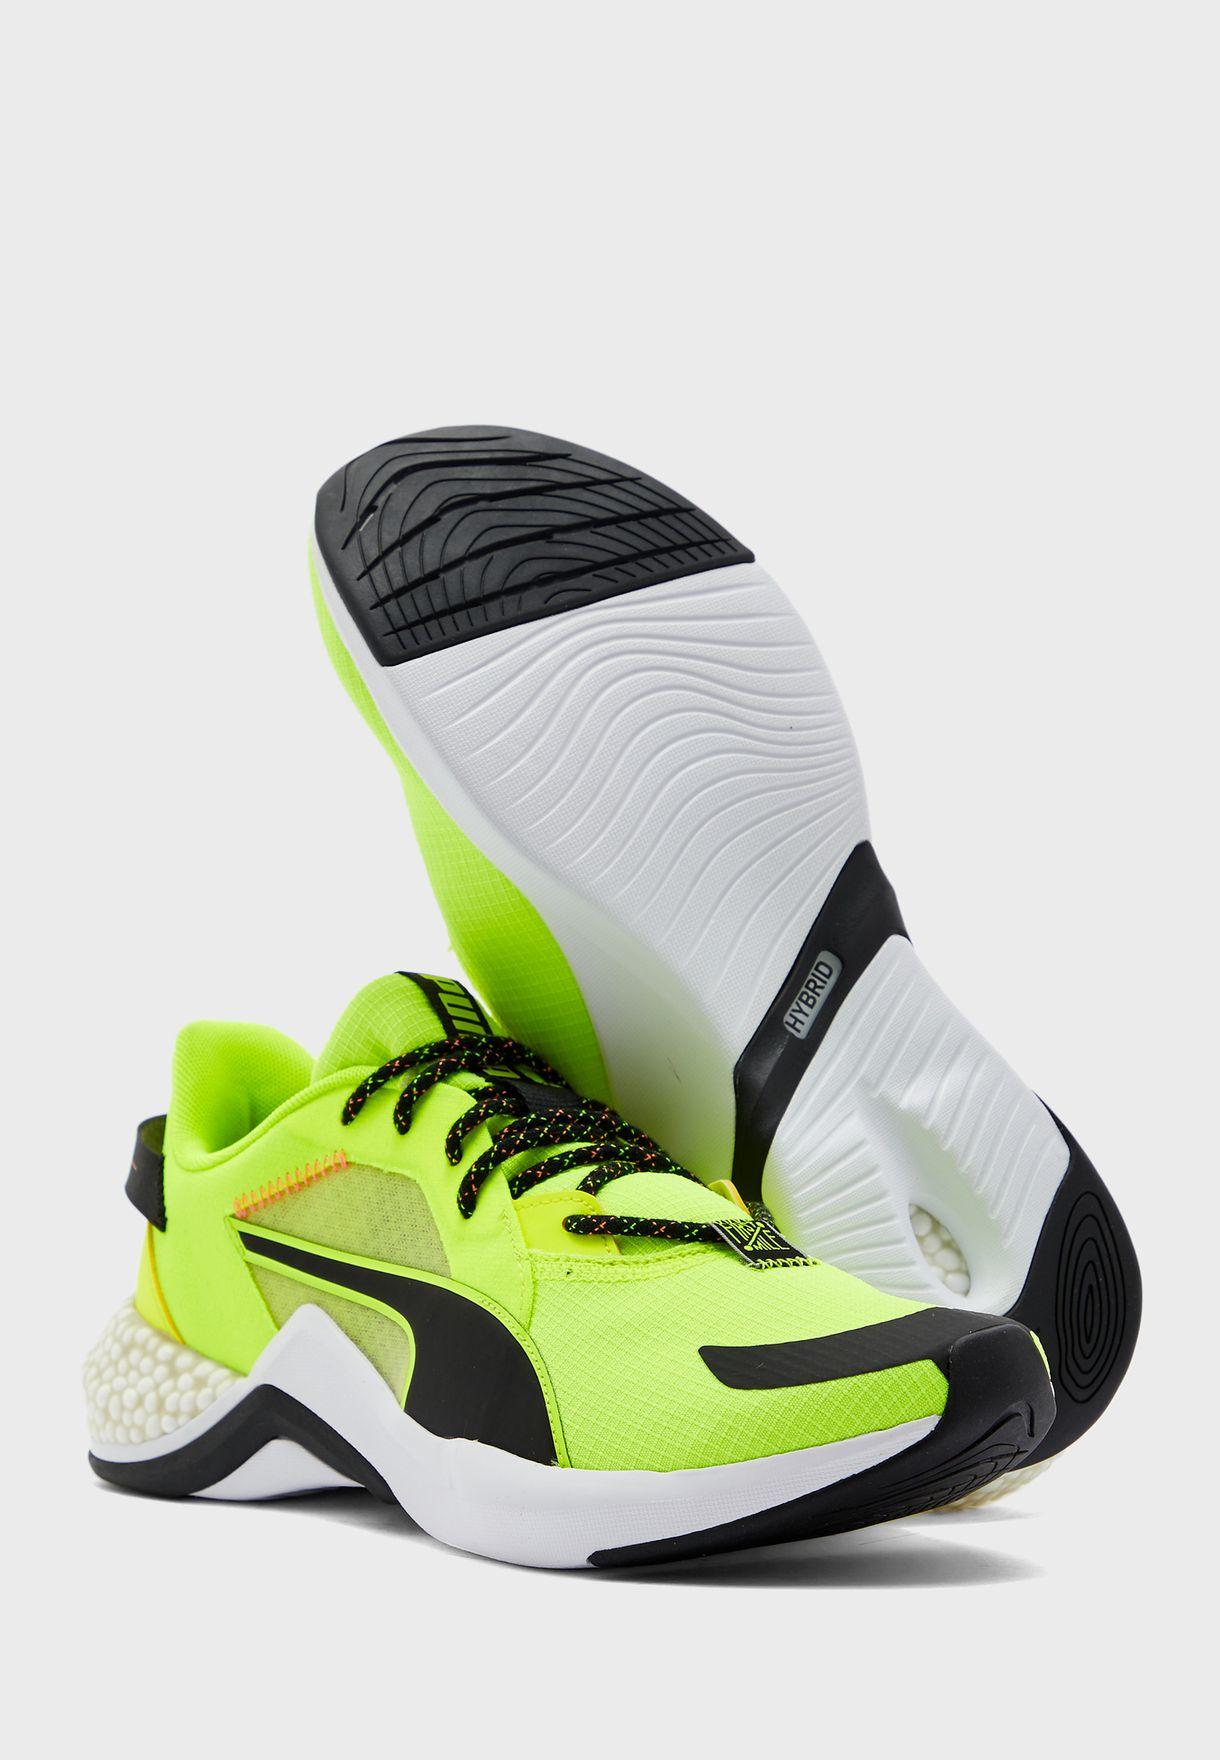 حذاء هايبرد ان اكس او زون